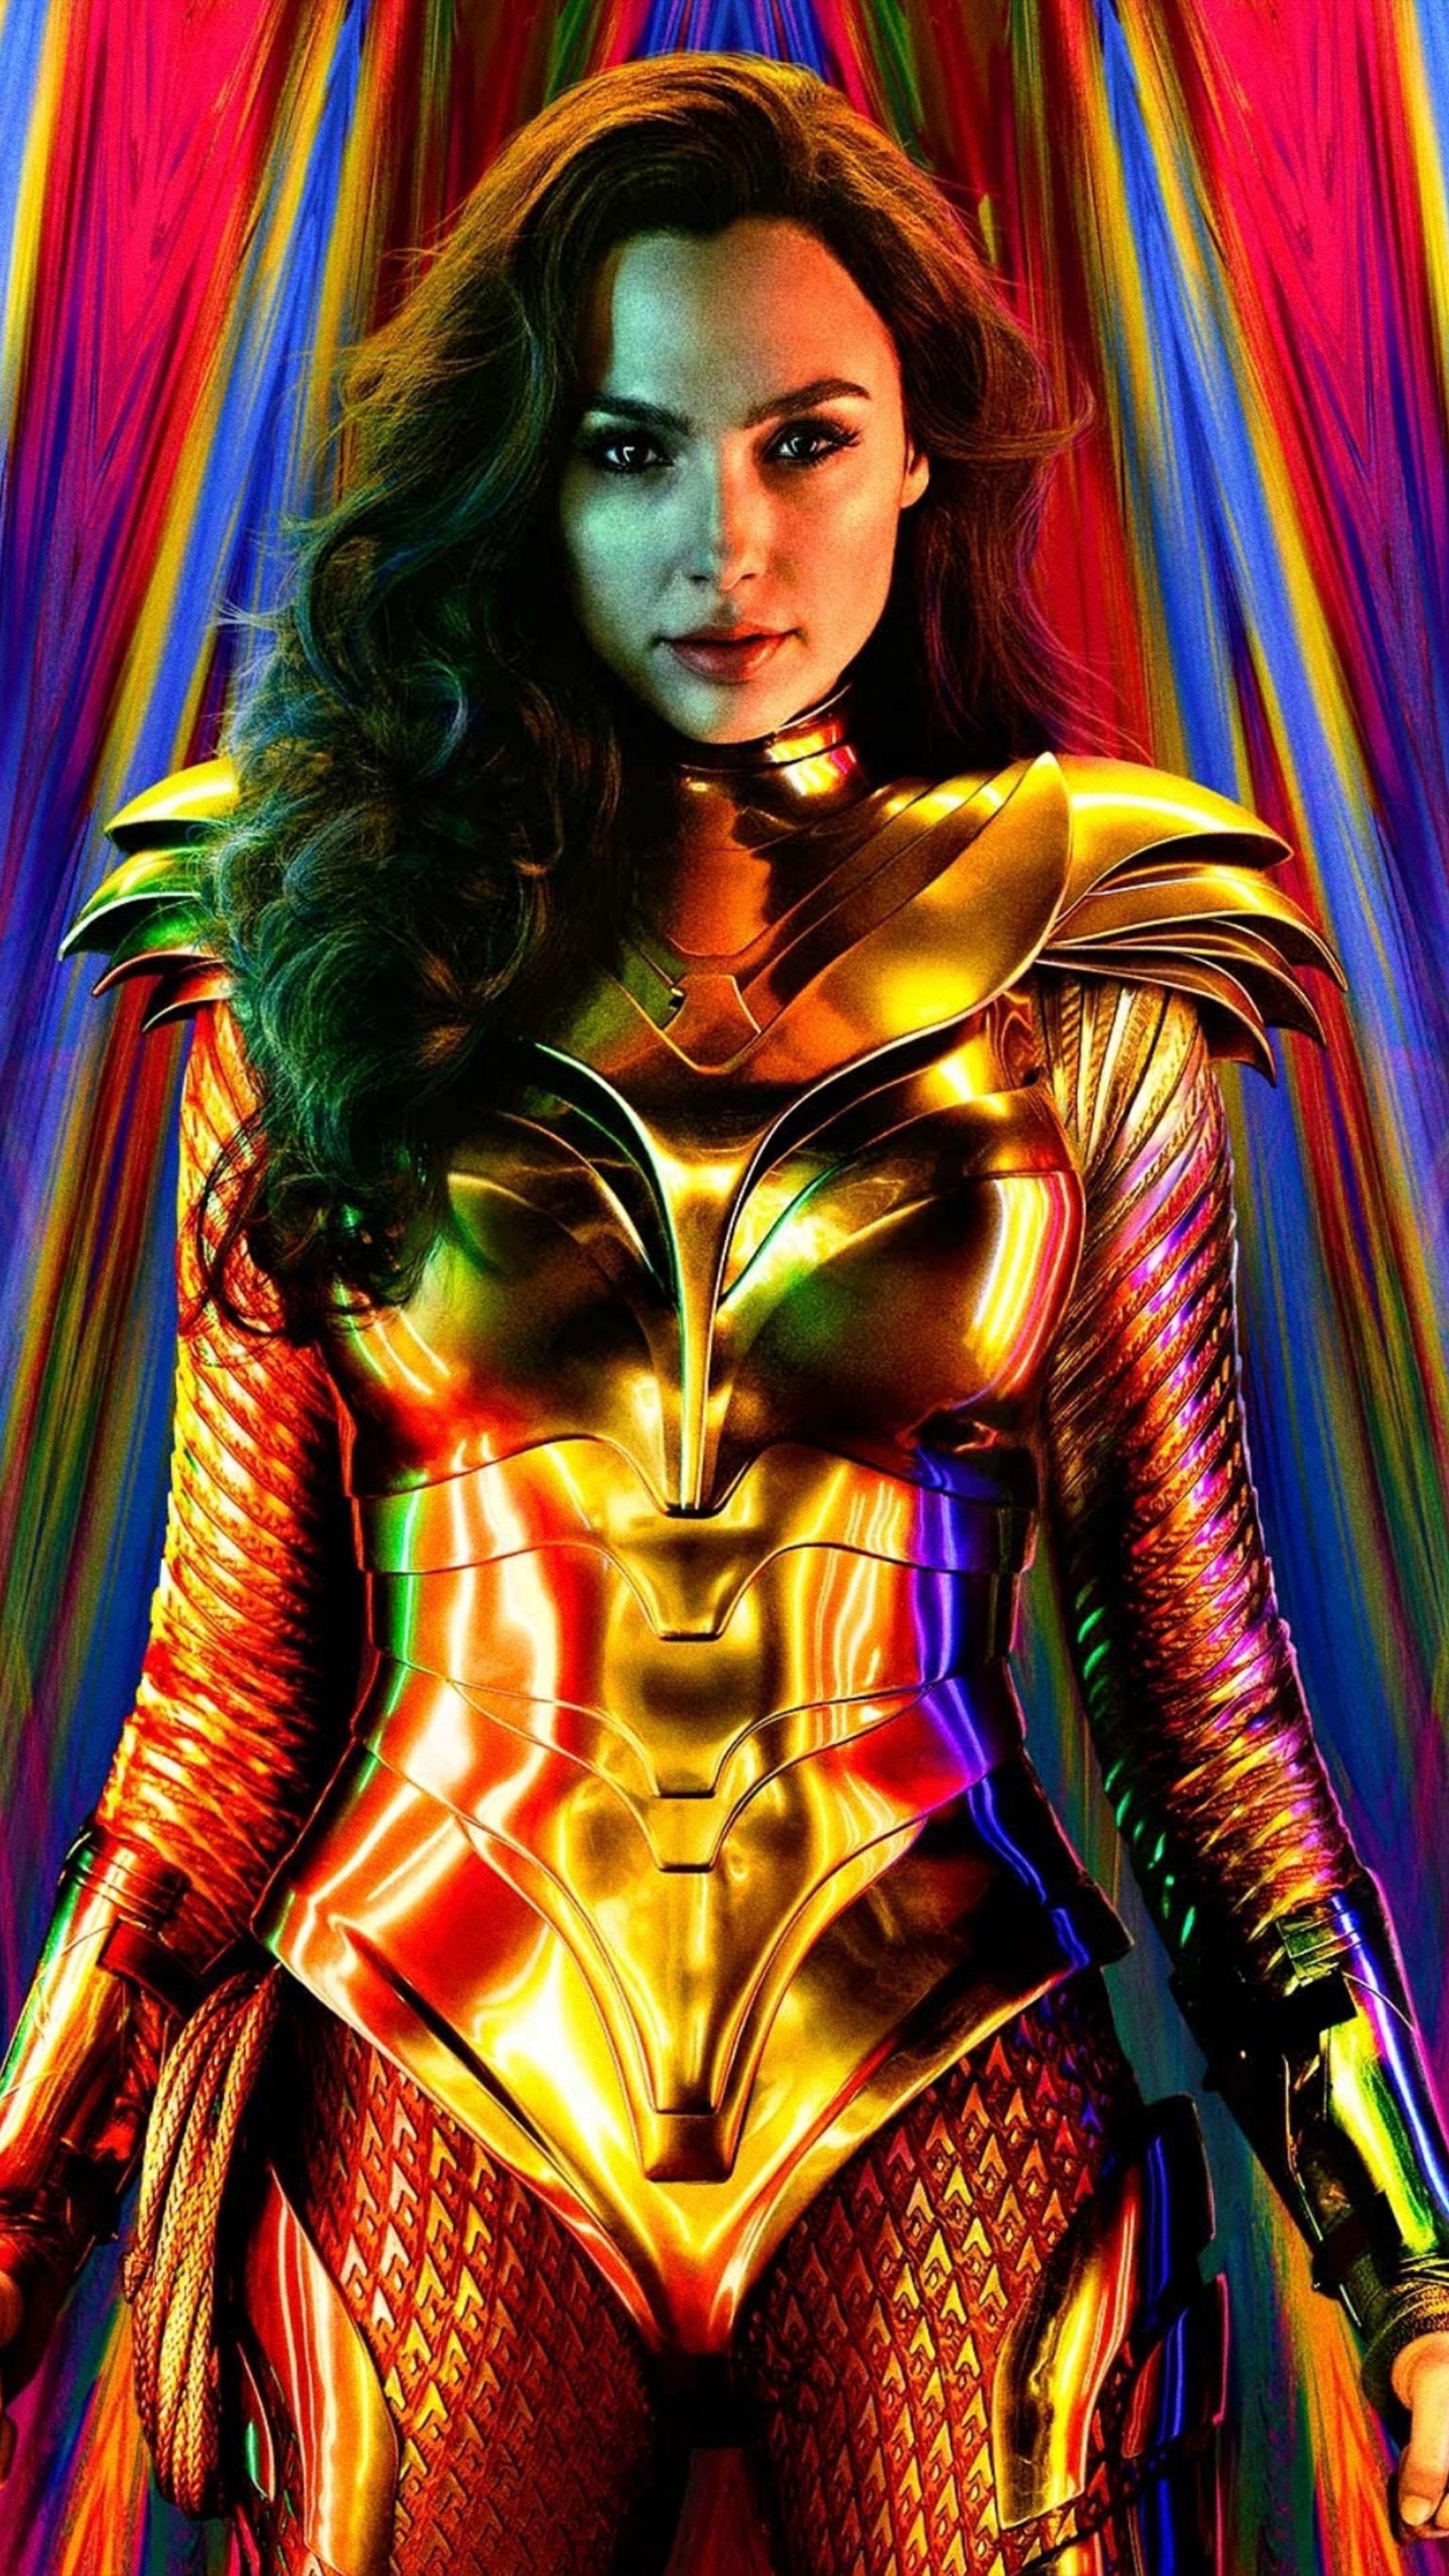 Wonder Woman 1984 Gal Gadot Wallpapers Wallpaper Cave